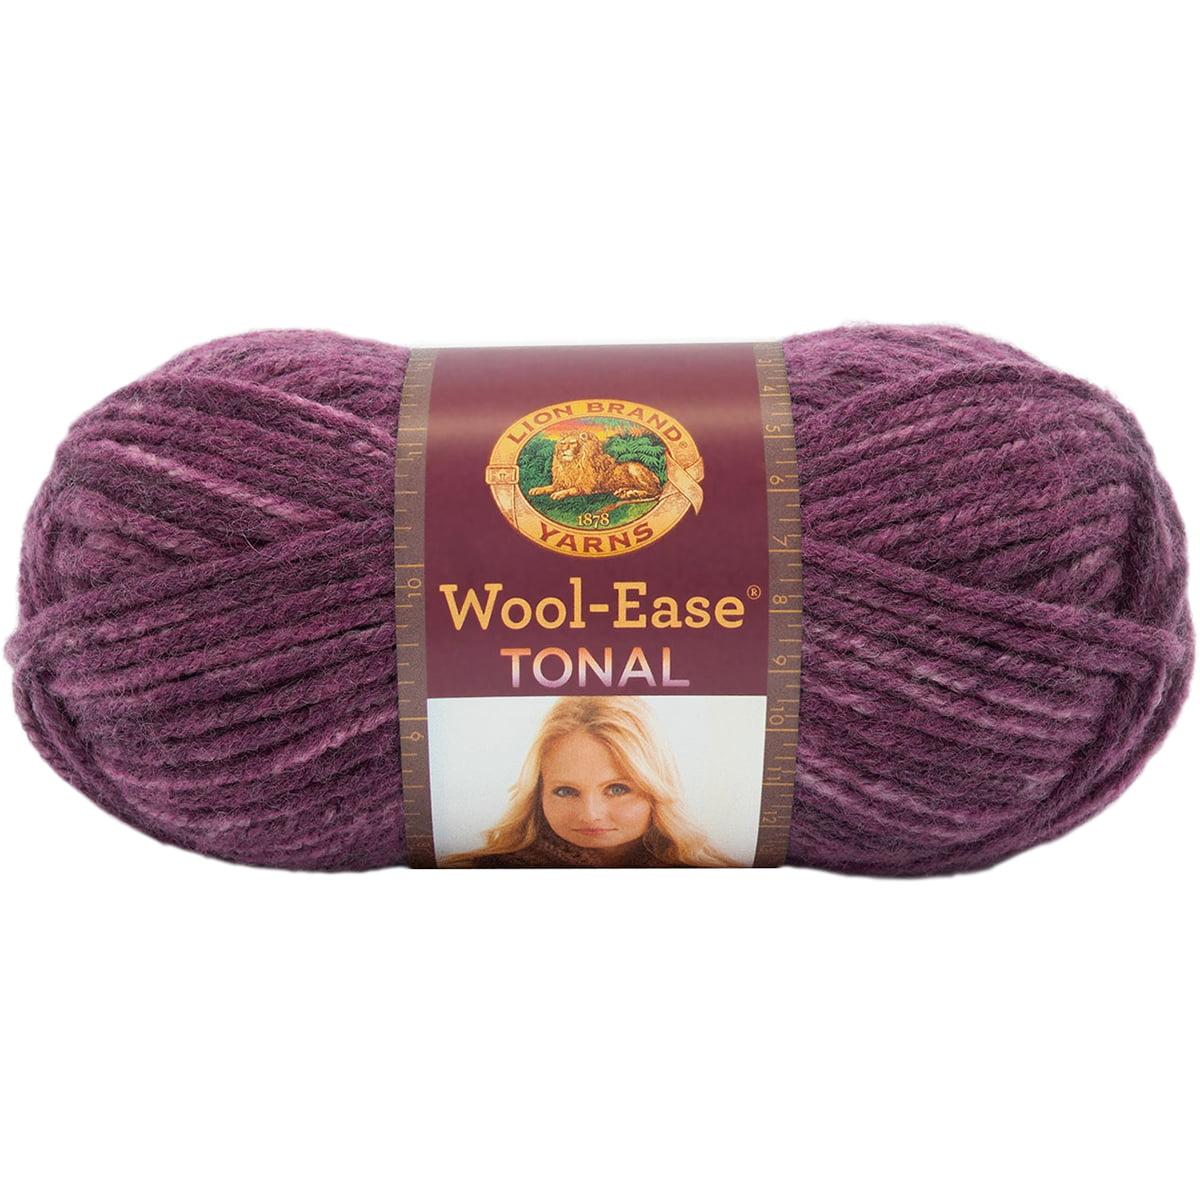 Lion Brand 635-145 Wool-Ease Tonal Yarn-Plum